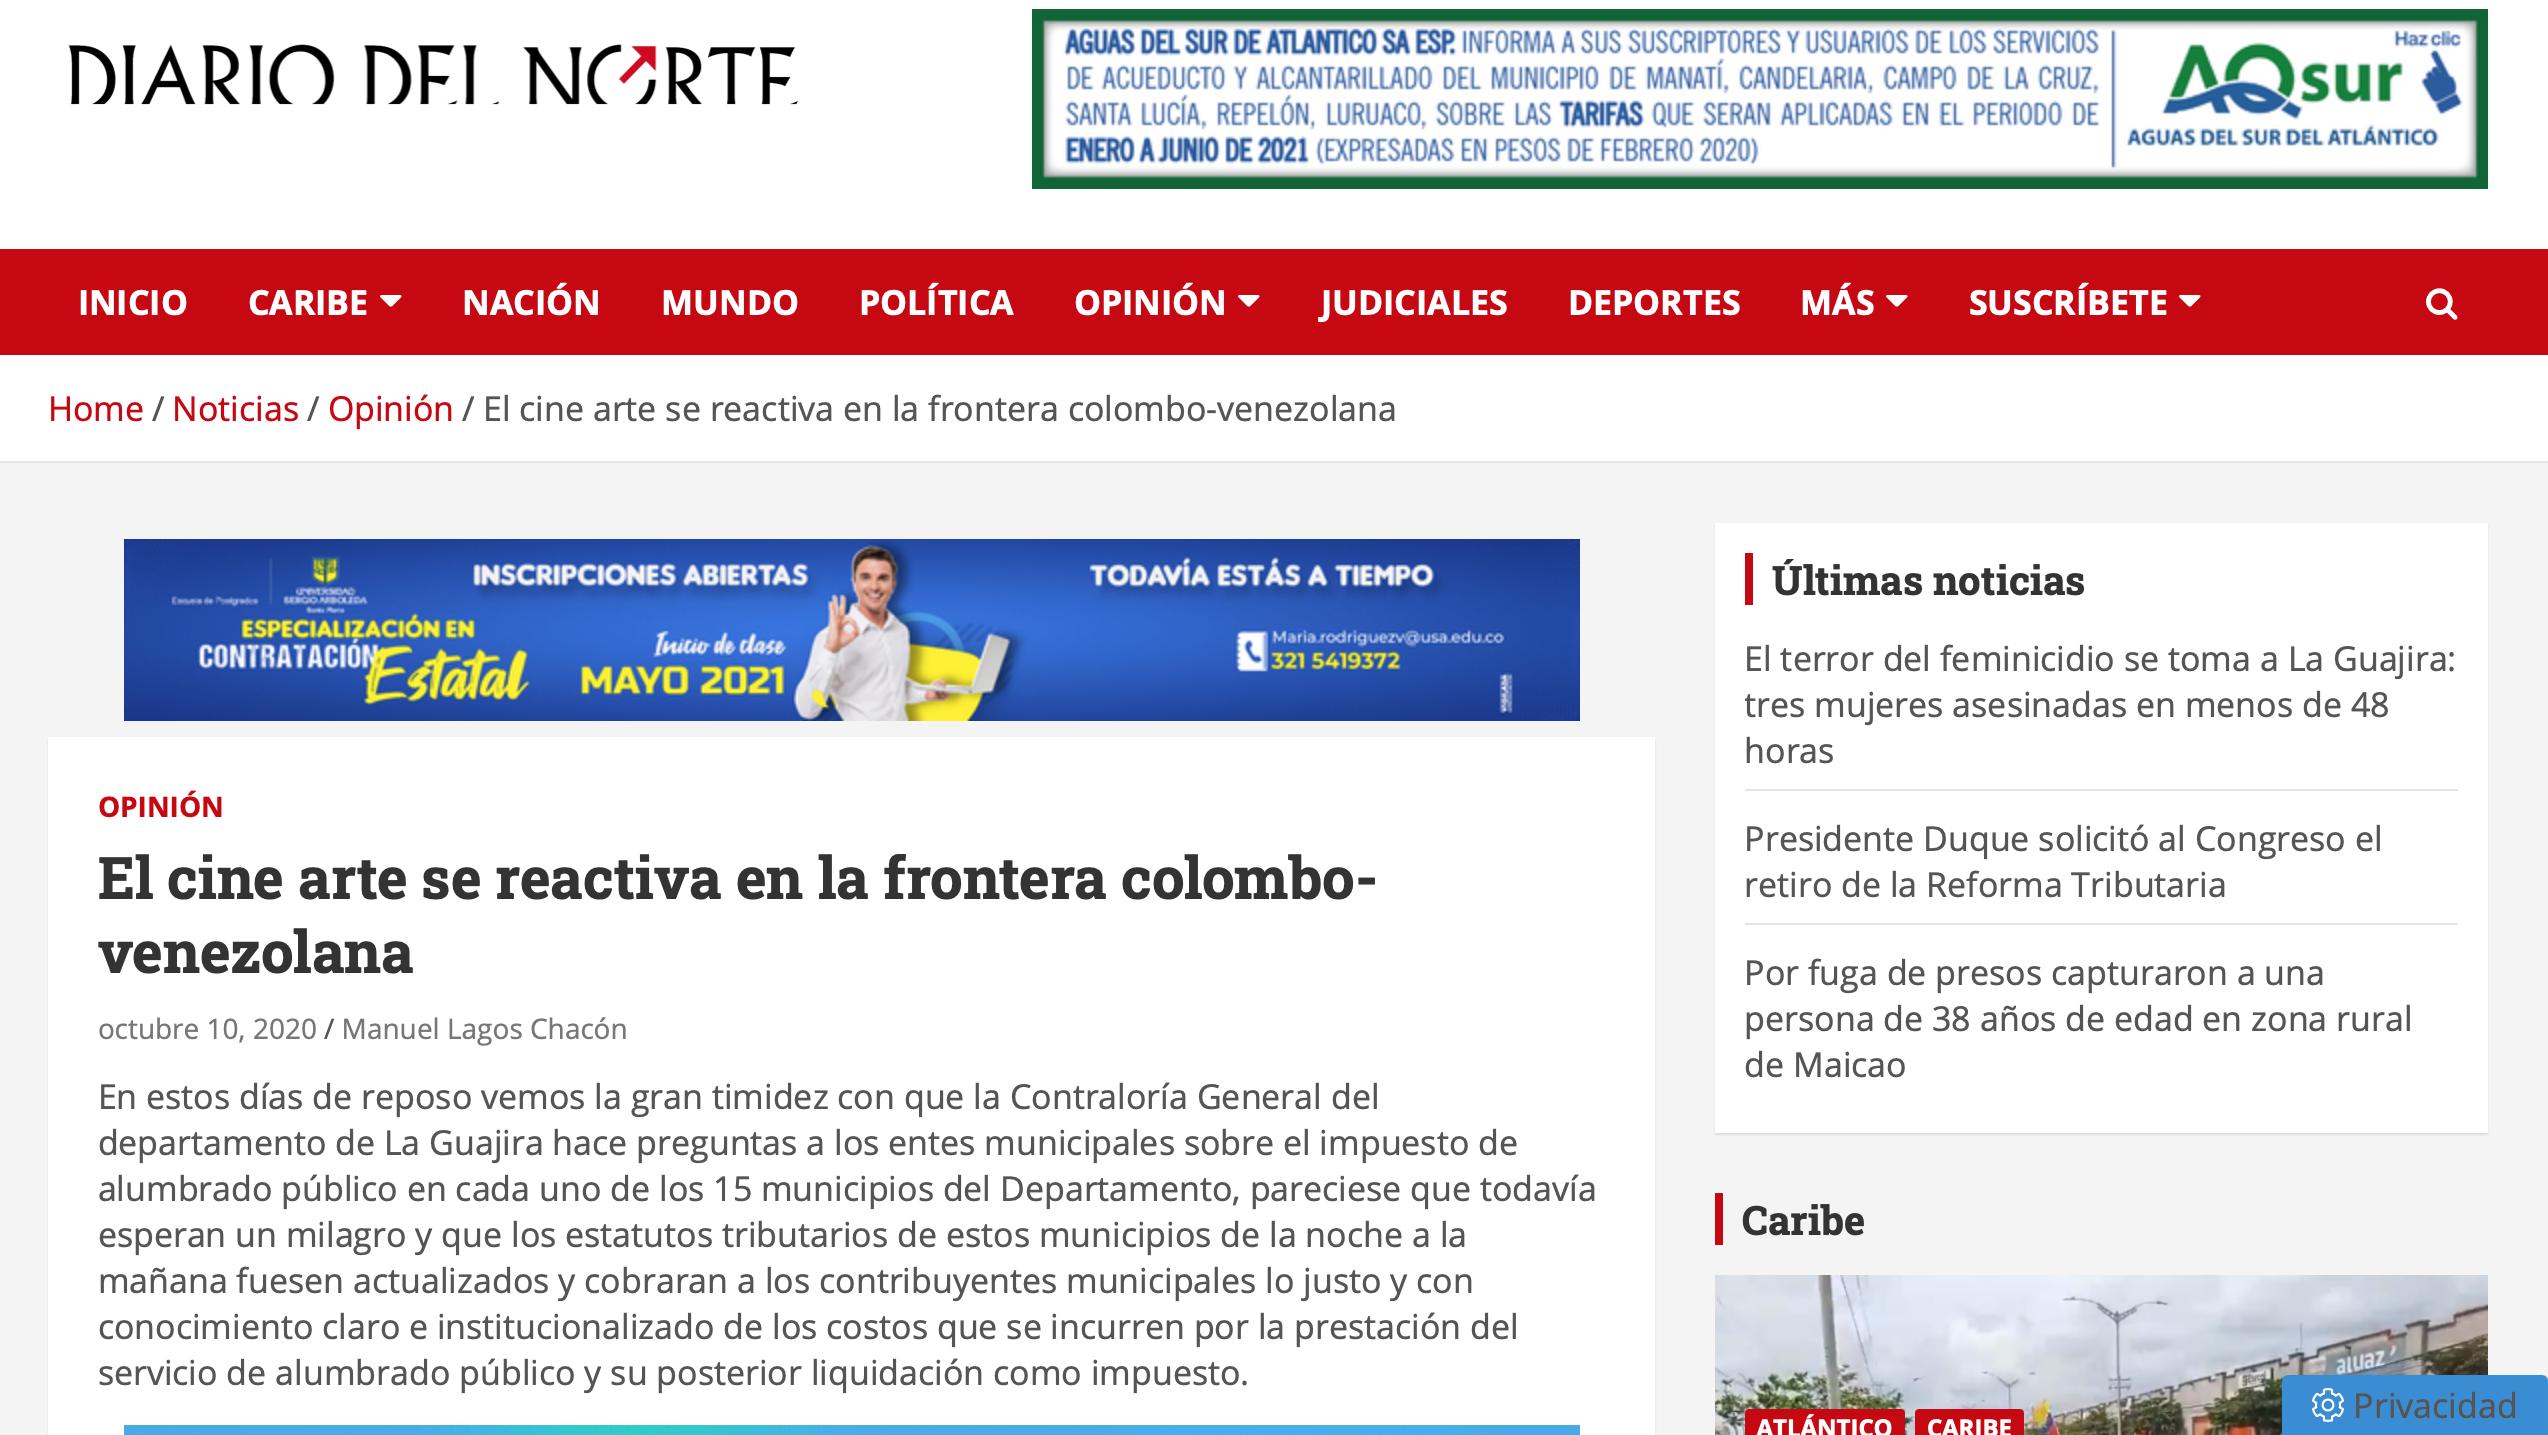 Diario del Norte 1 Screenshot 2021-05-02 at 19.56.33